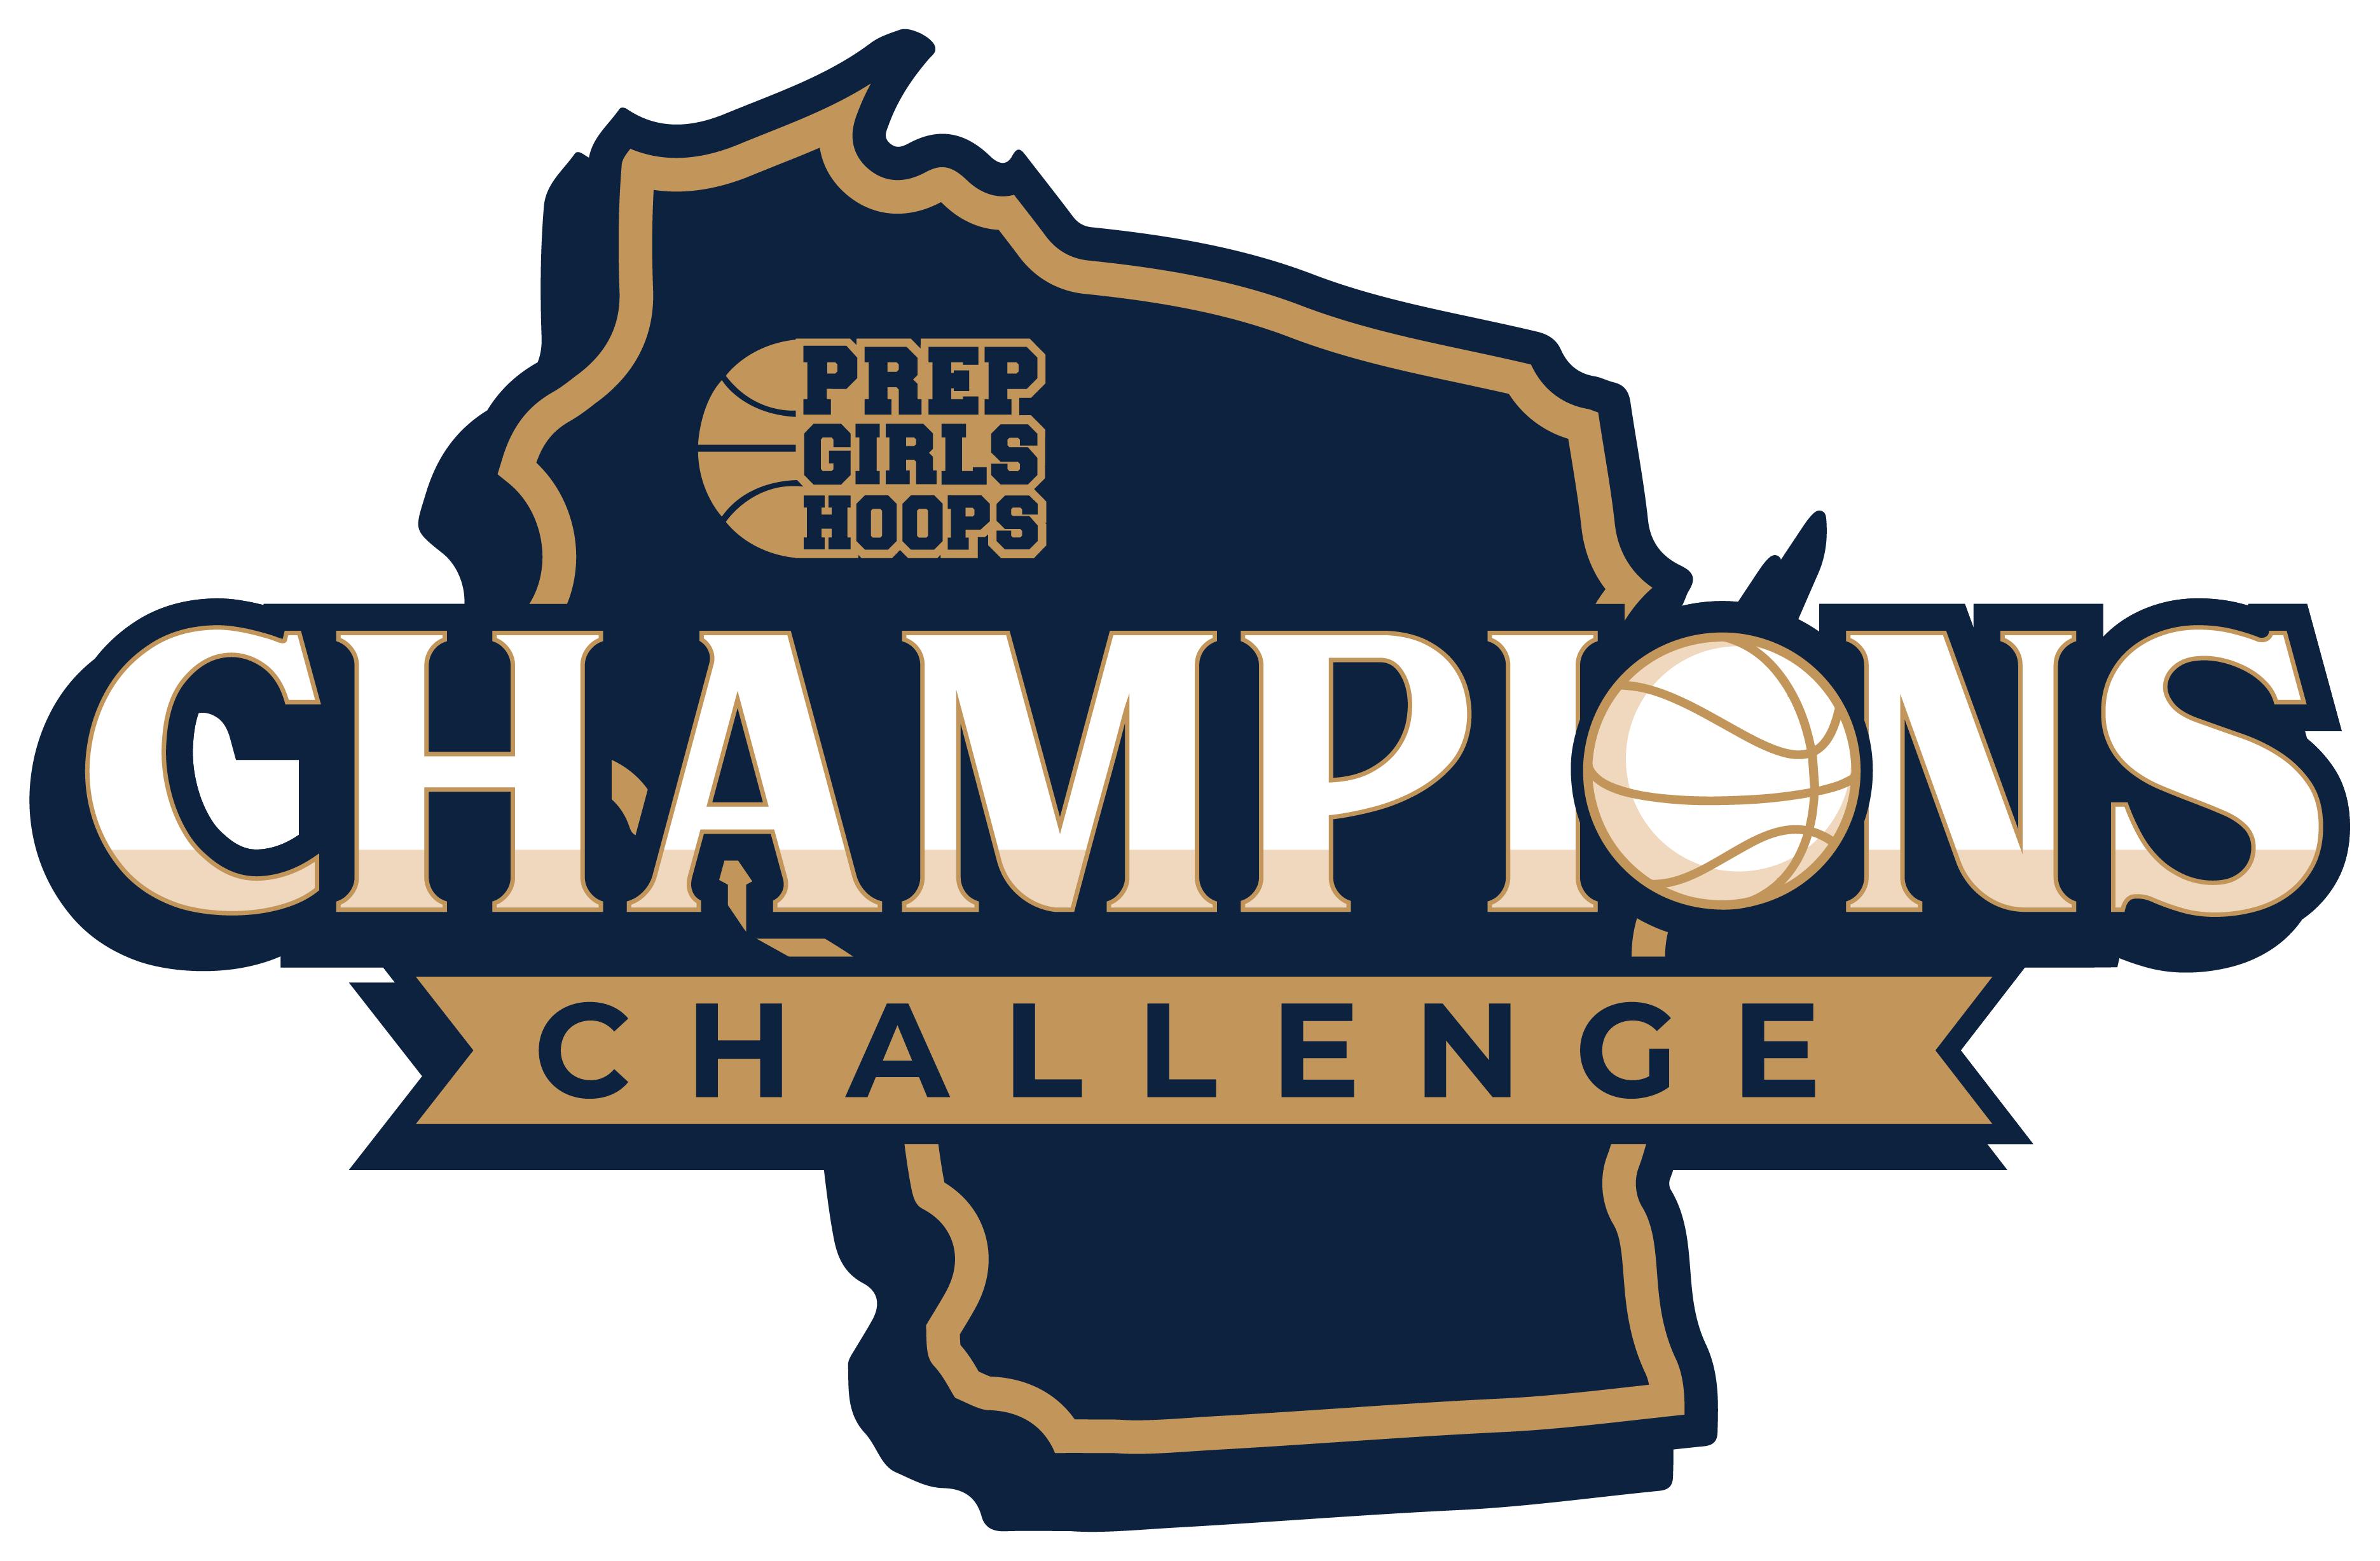 Champions Challenge